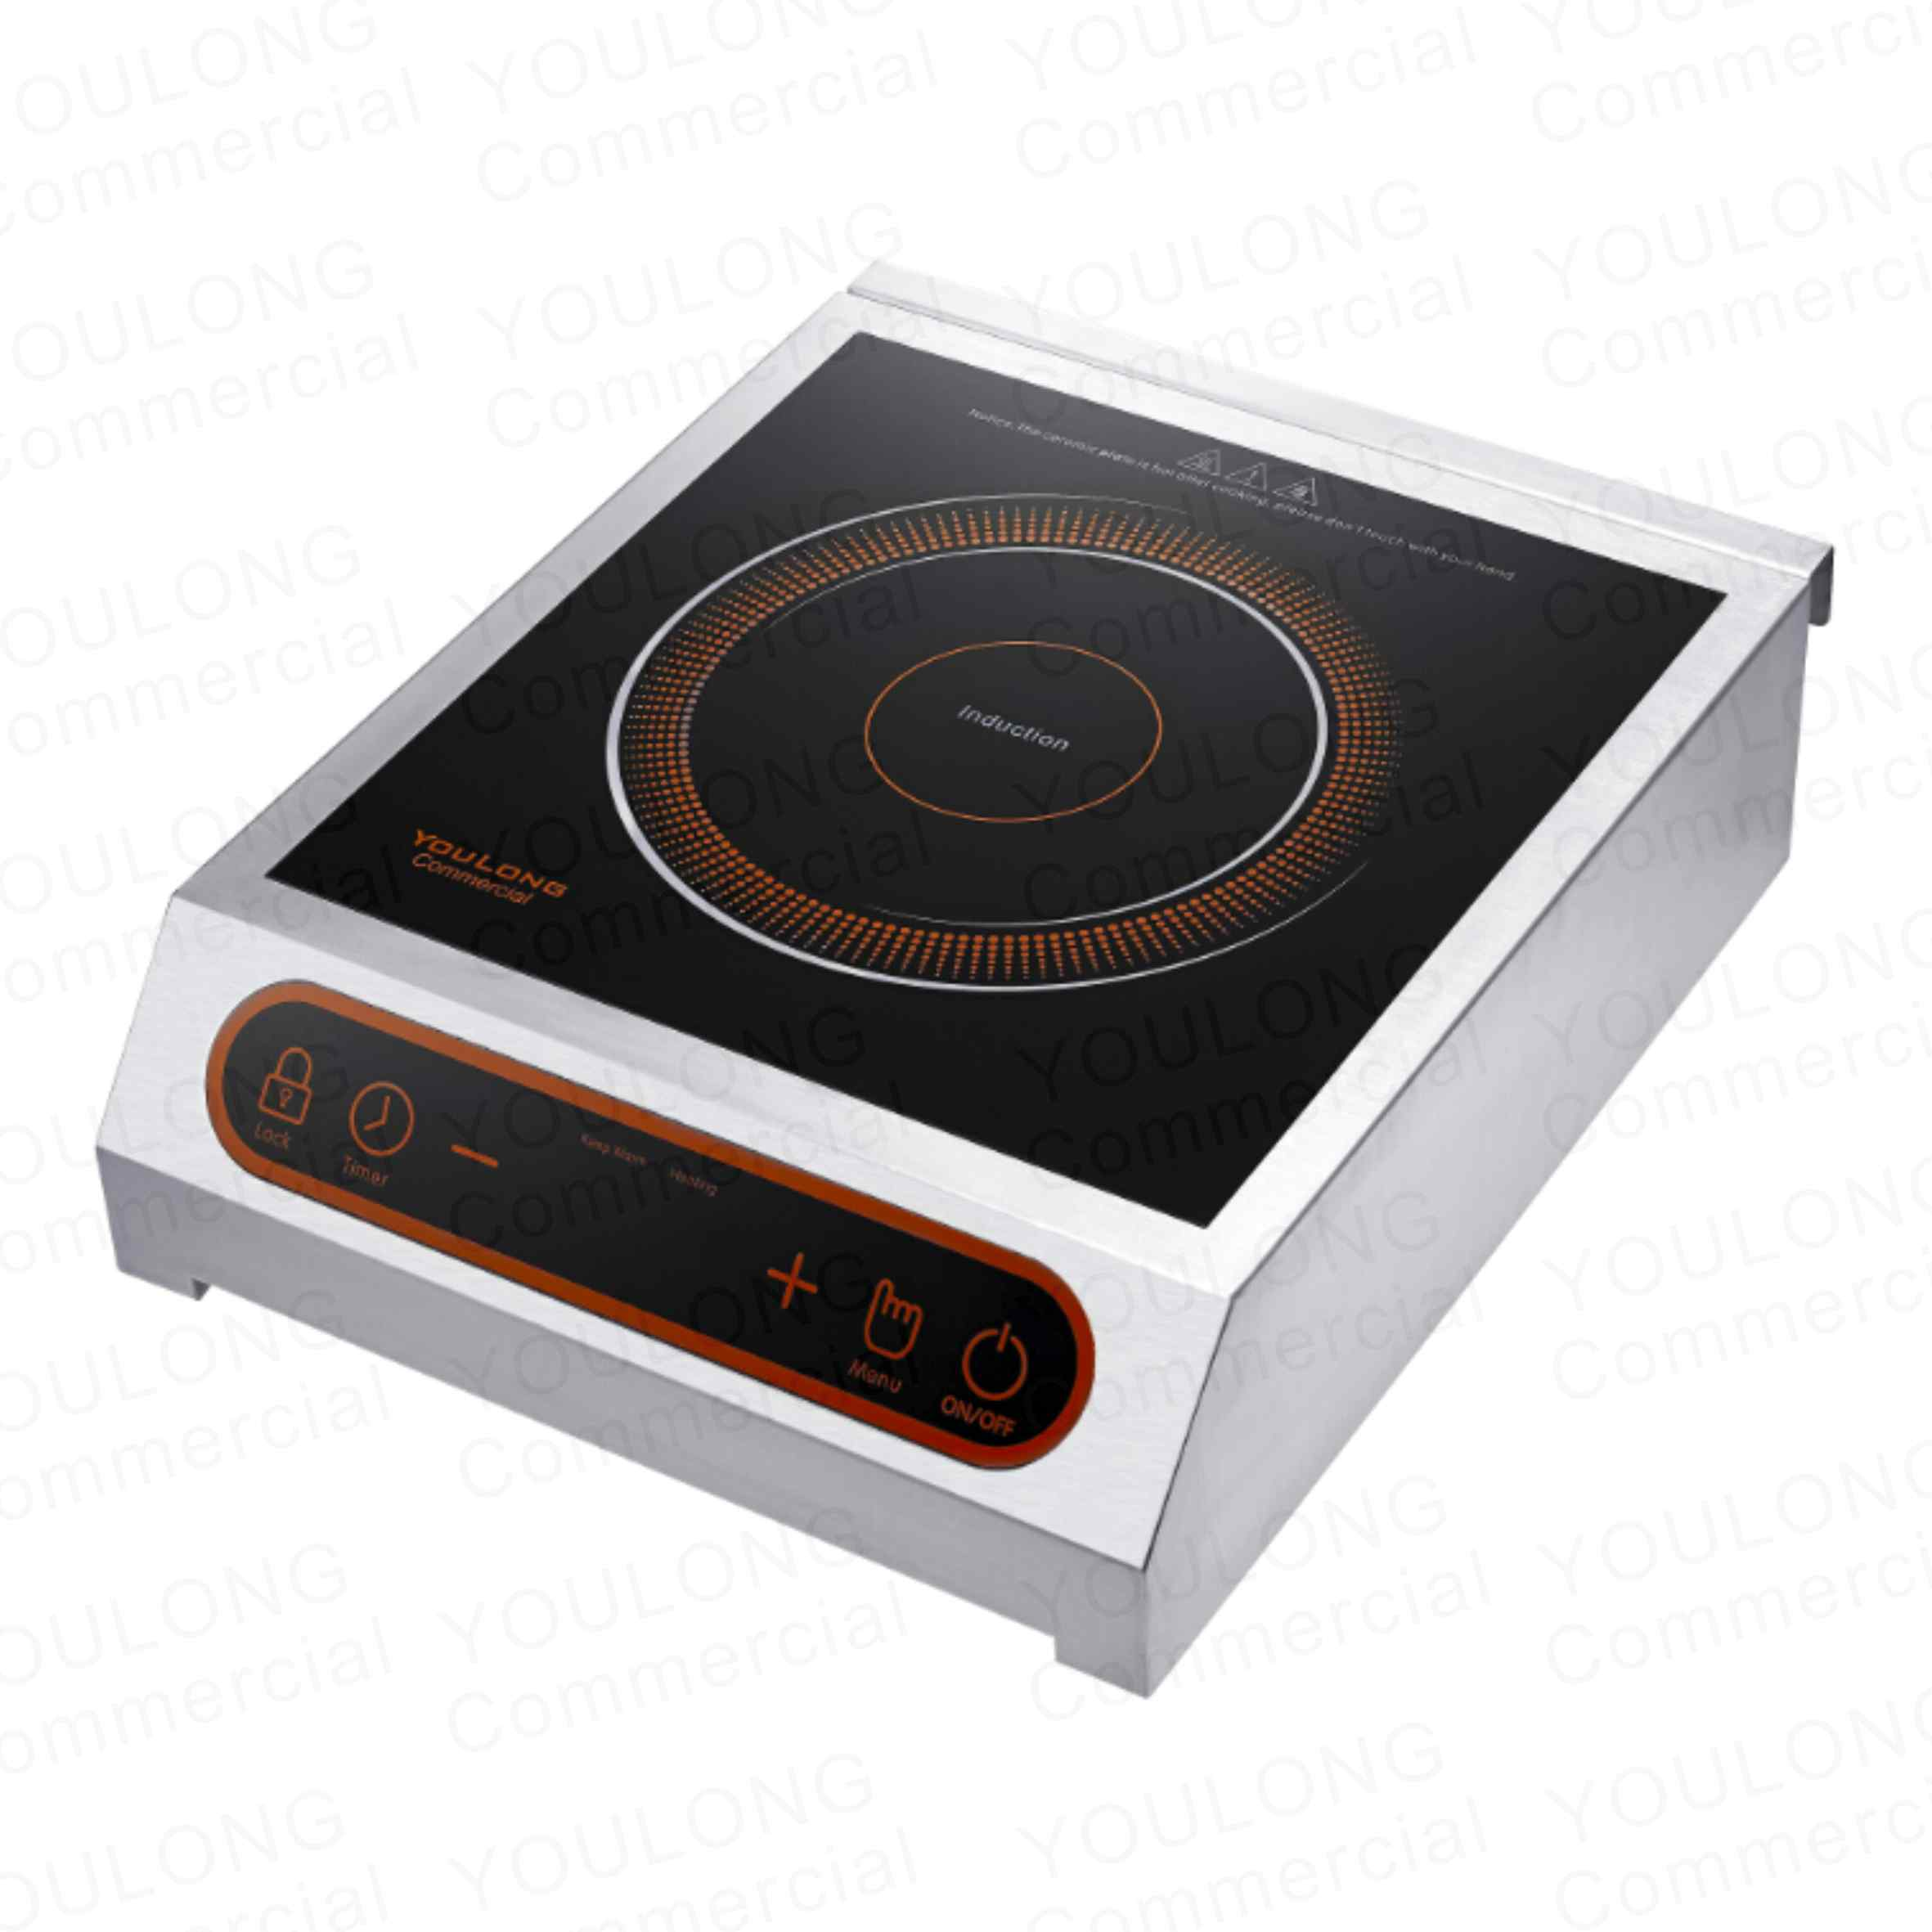 Commercial Induction Cooker ~ Commercial induction cooker global trade leader ecrobot